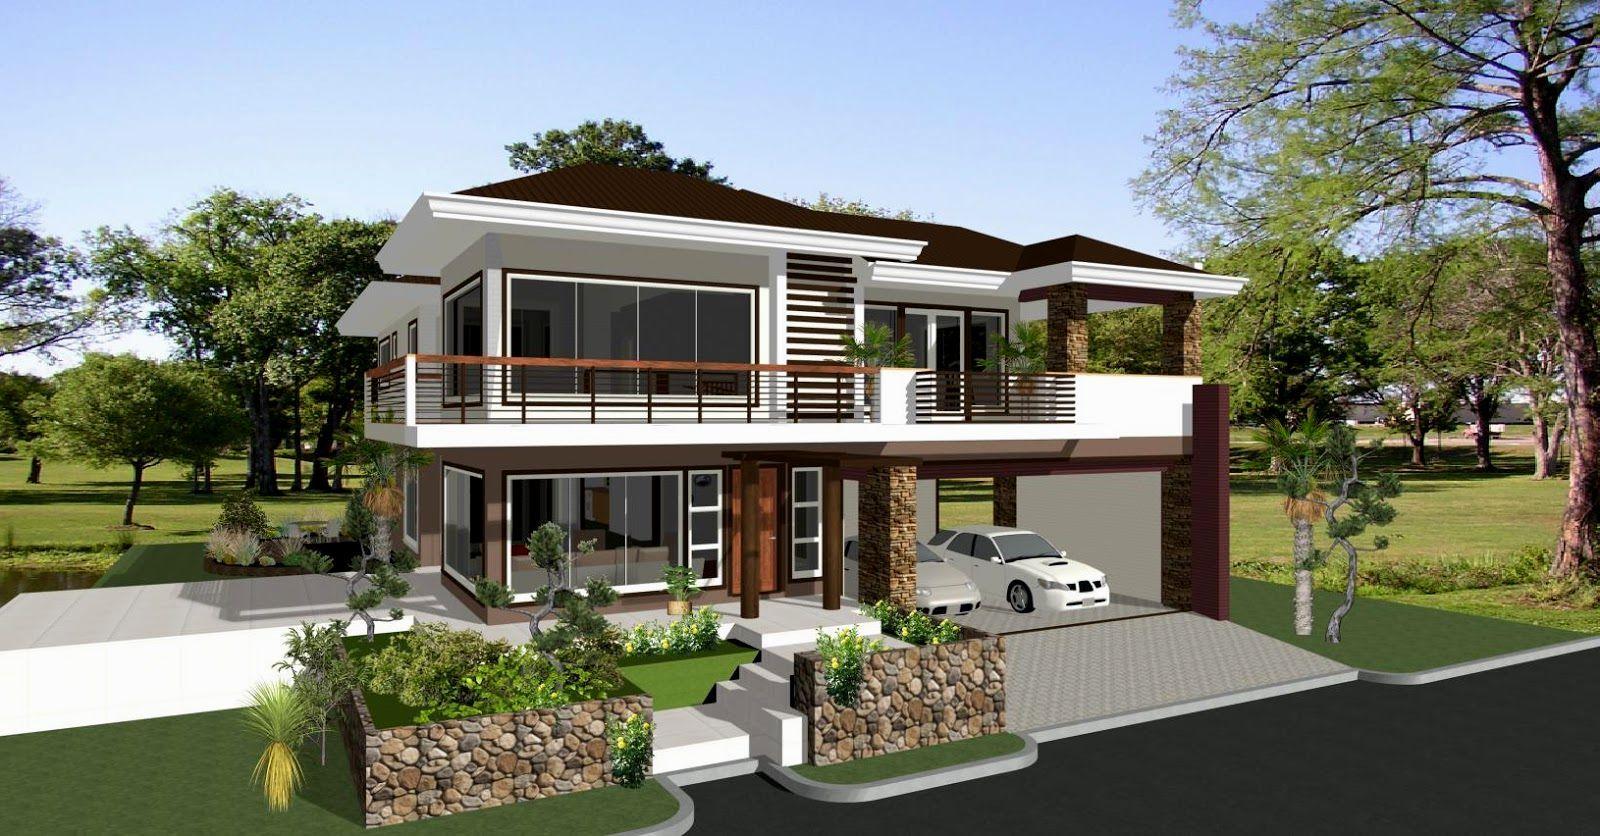 84 Interior Design Cost Estimate Philippines 16 Best Houses Images On Pinterest Interior